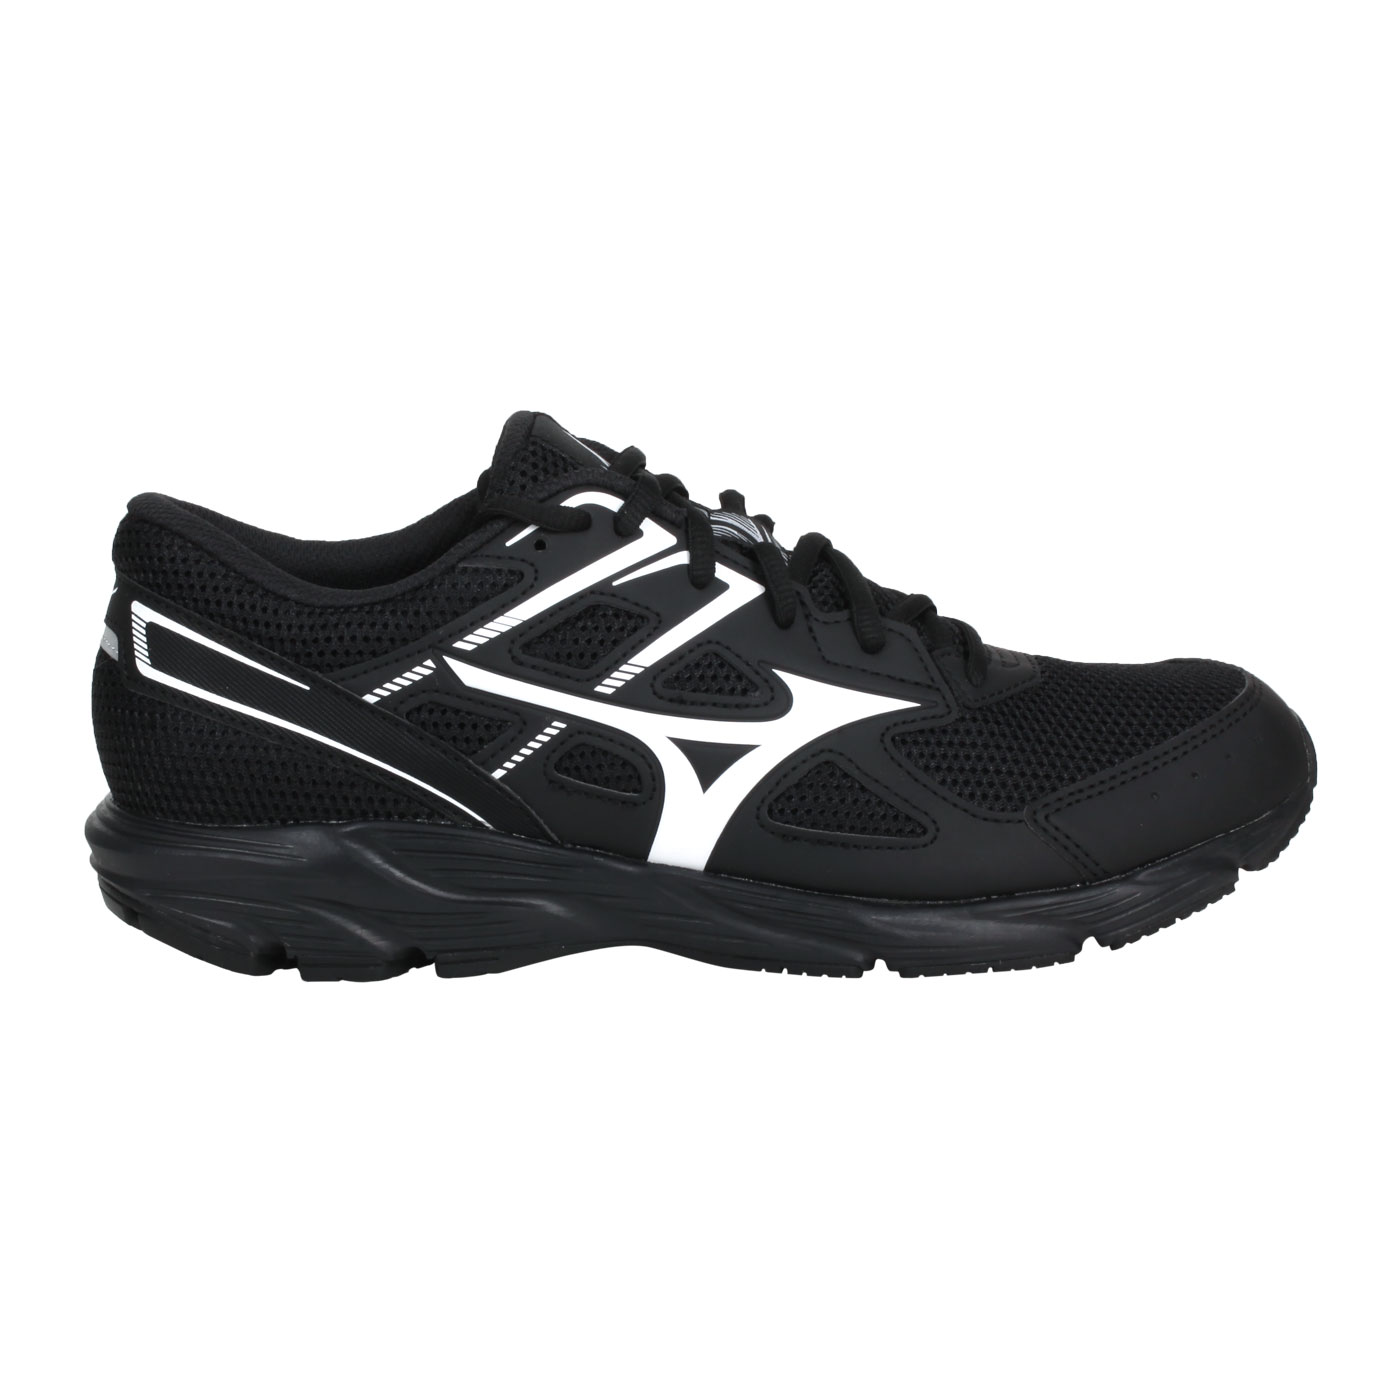 MIZUNO 男款慢跑鞋-WIDE  @MAXIMIZER 23@K1GA210010 - 黑白